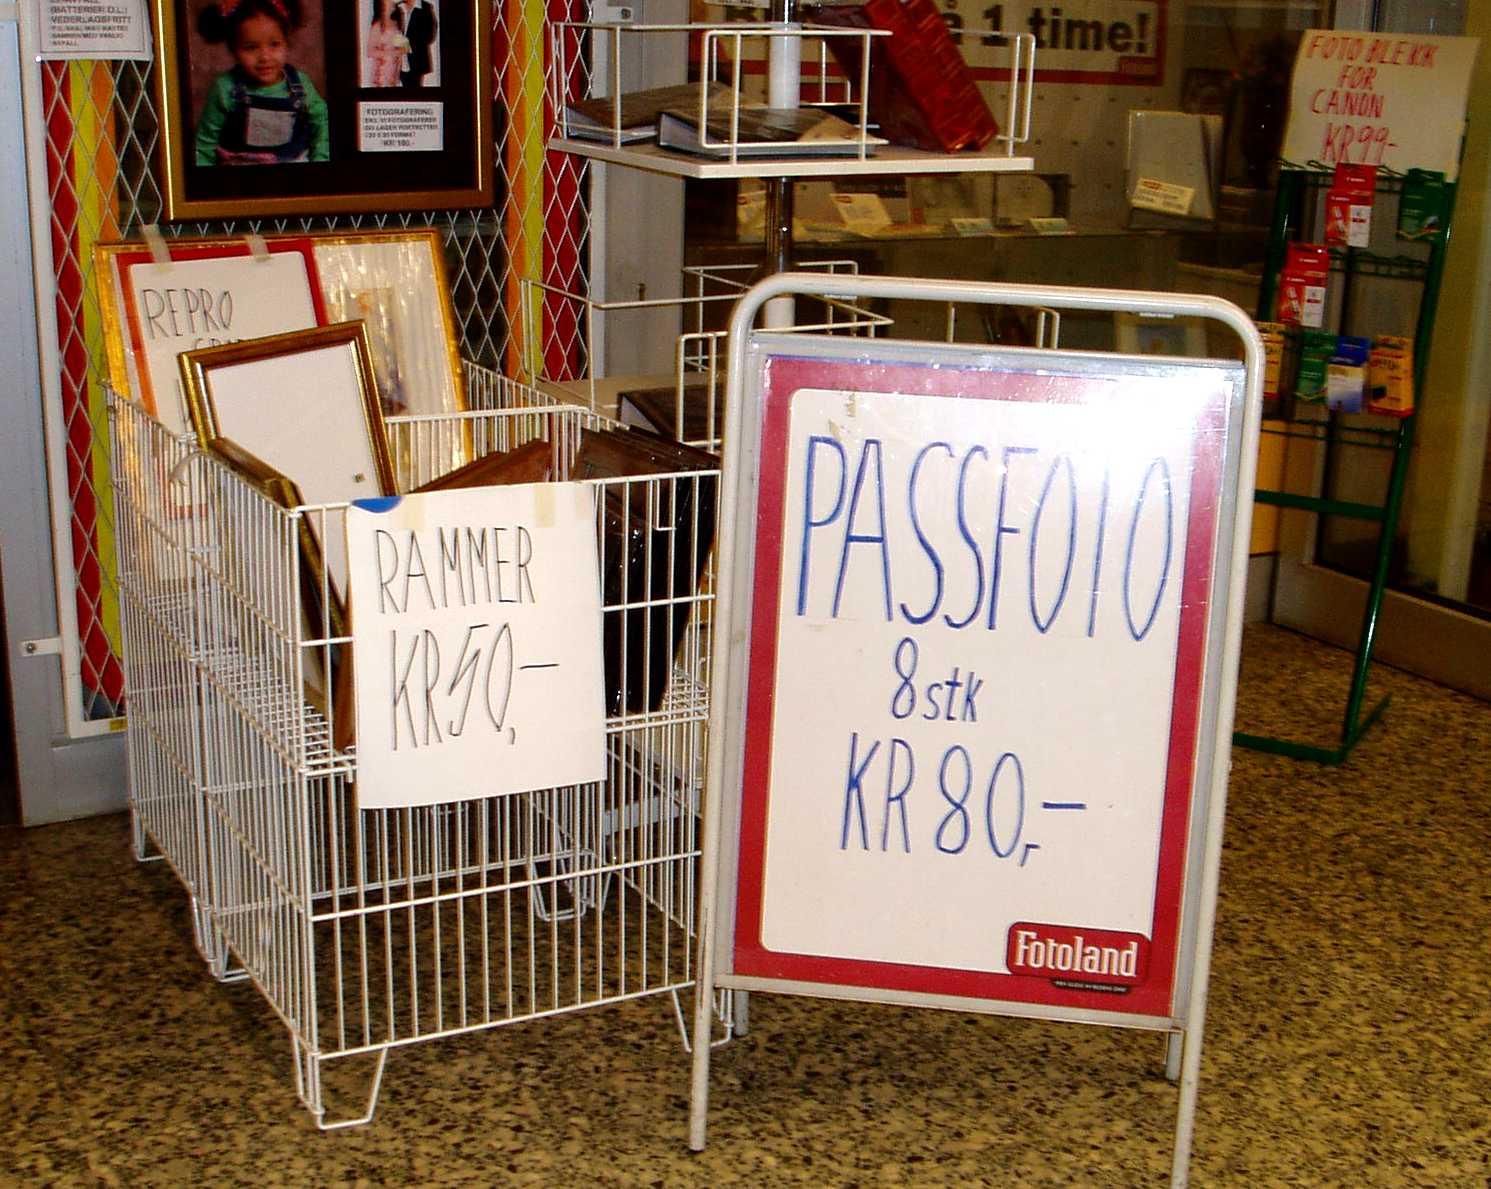 PASSFOTO - 8 stk - KR 80,-